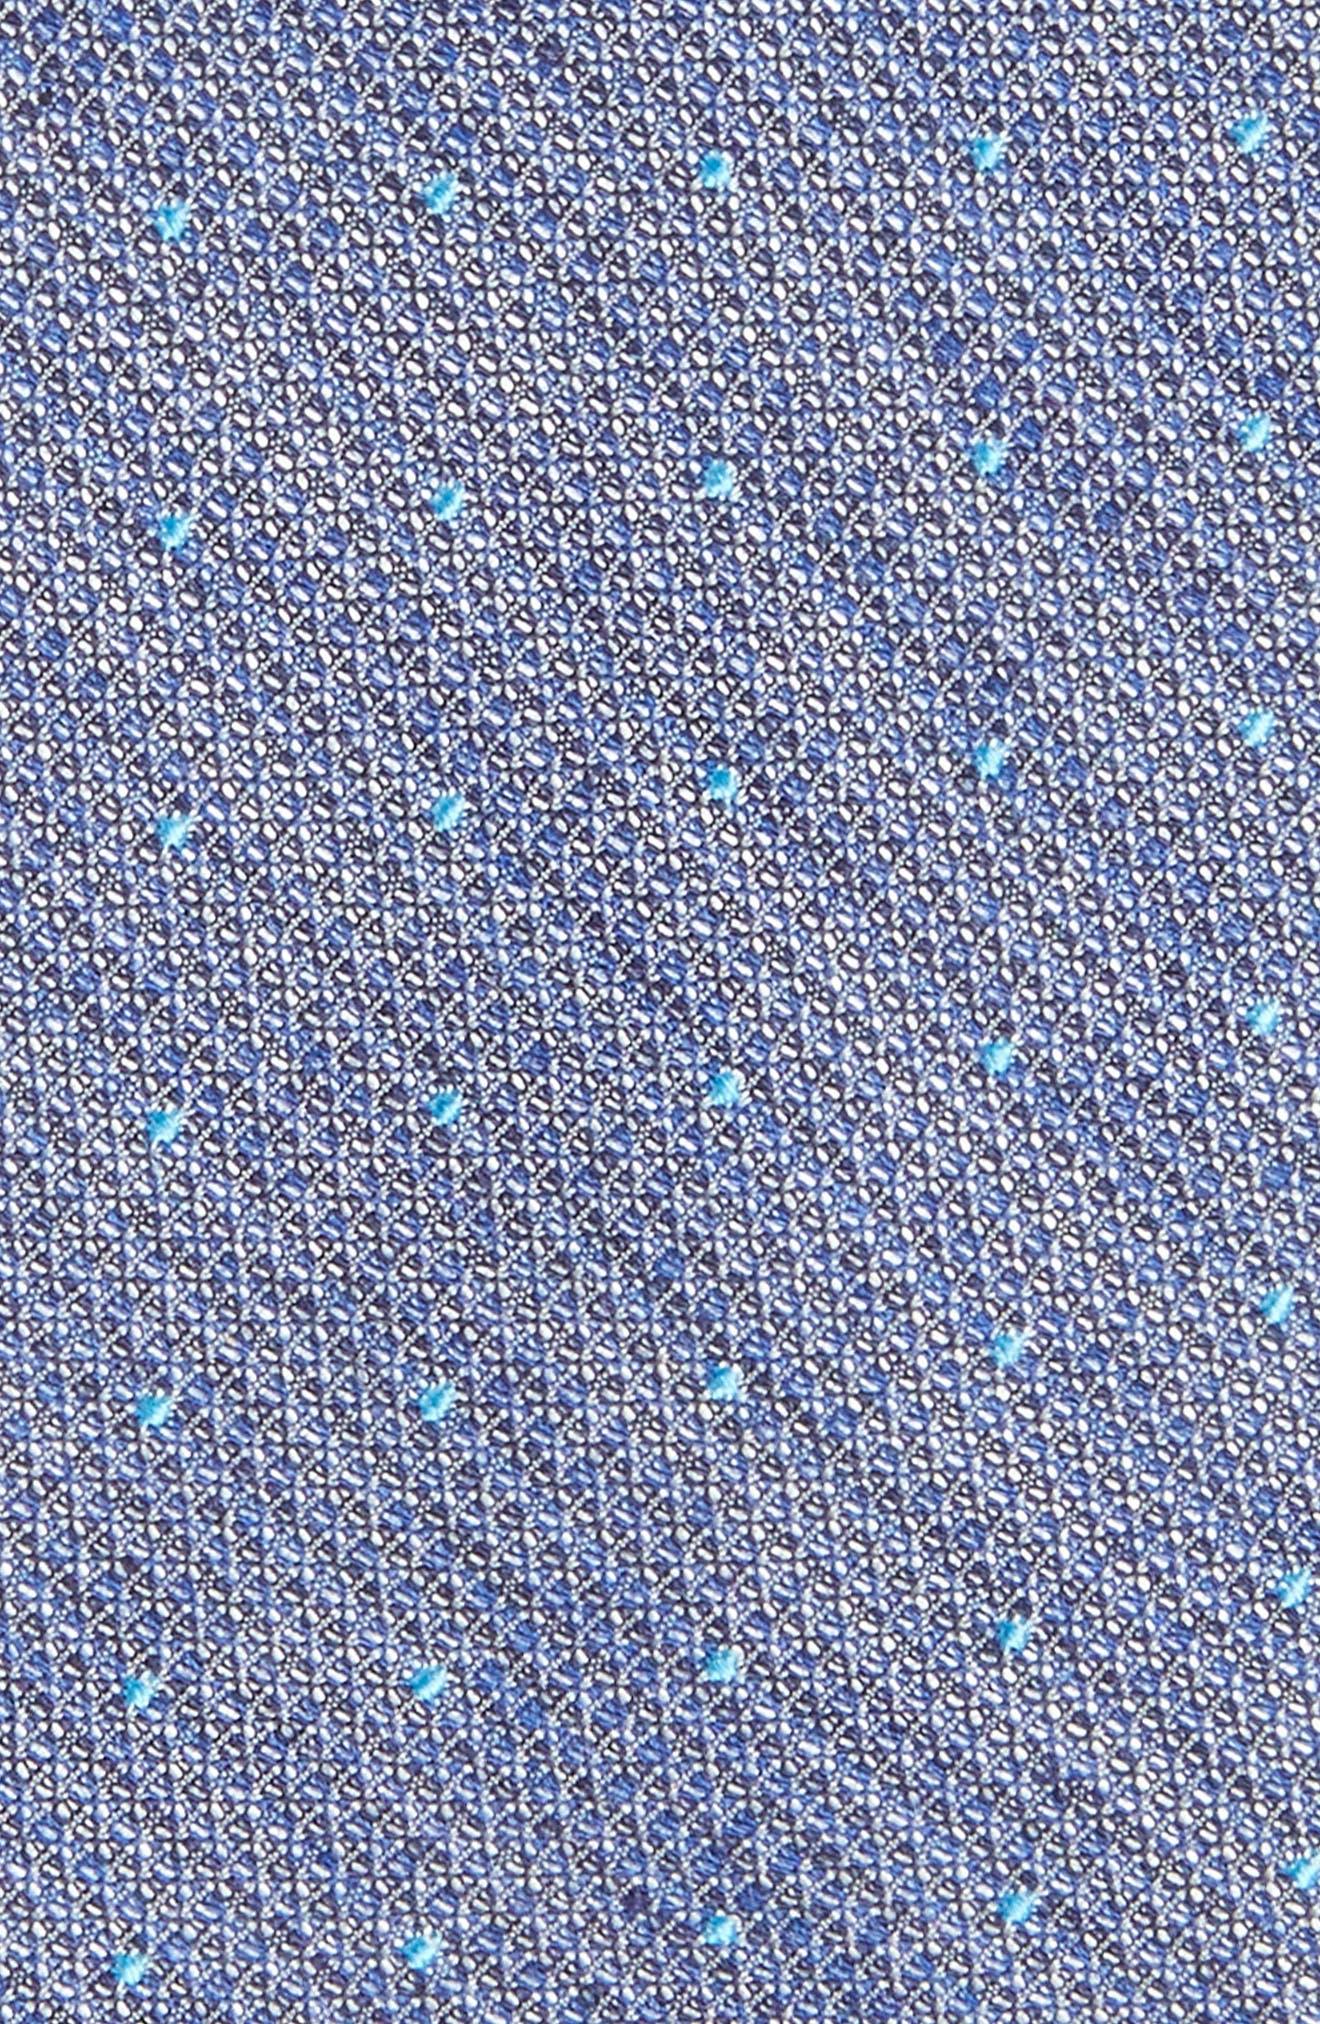 Dot Silk Blend Skinny Tie,                             Alternate thumbnail 2, color,                             Aqua/ Teal